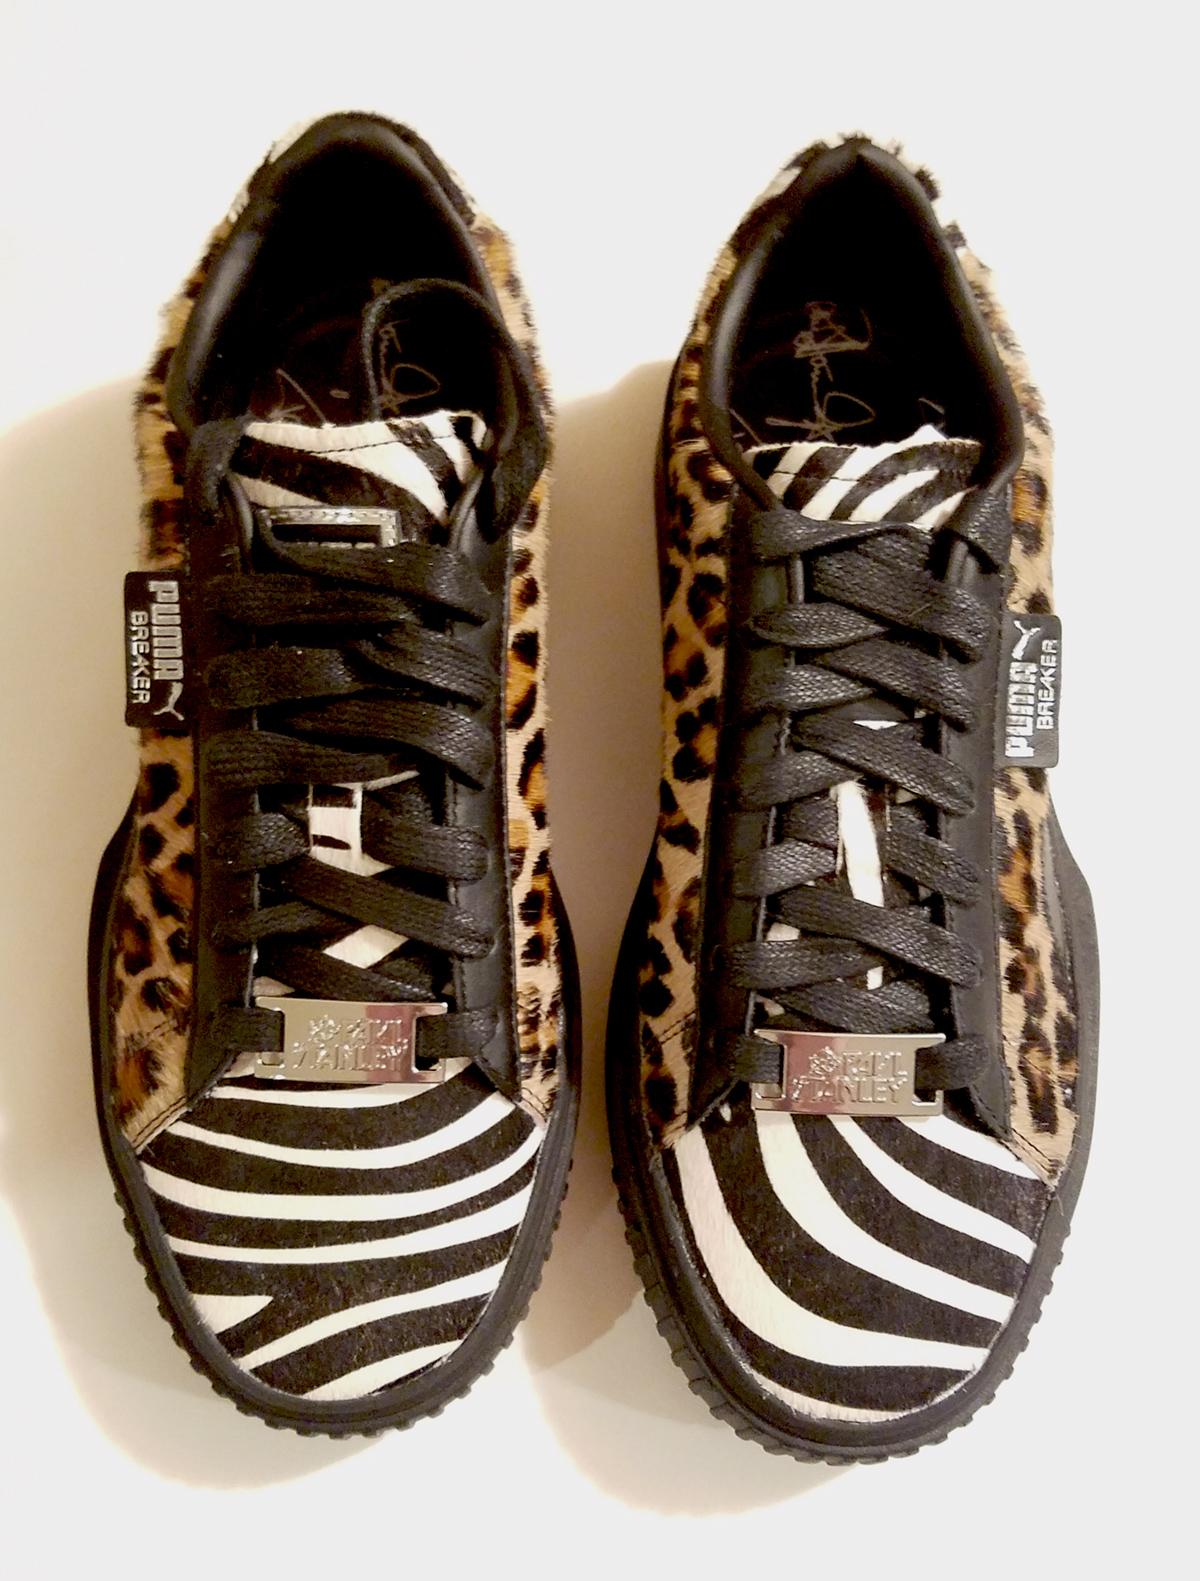 online retailer cc730 607be Paul Stanley Puma Breakers Sneakers